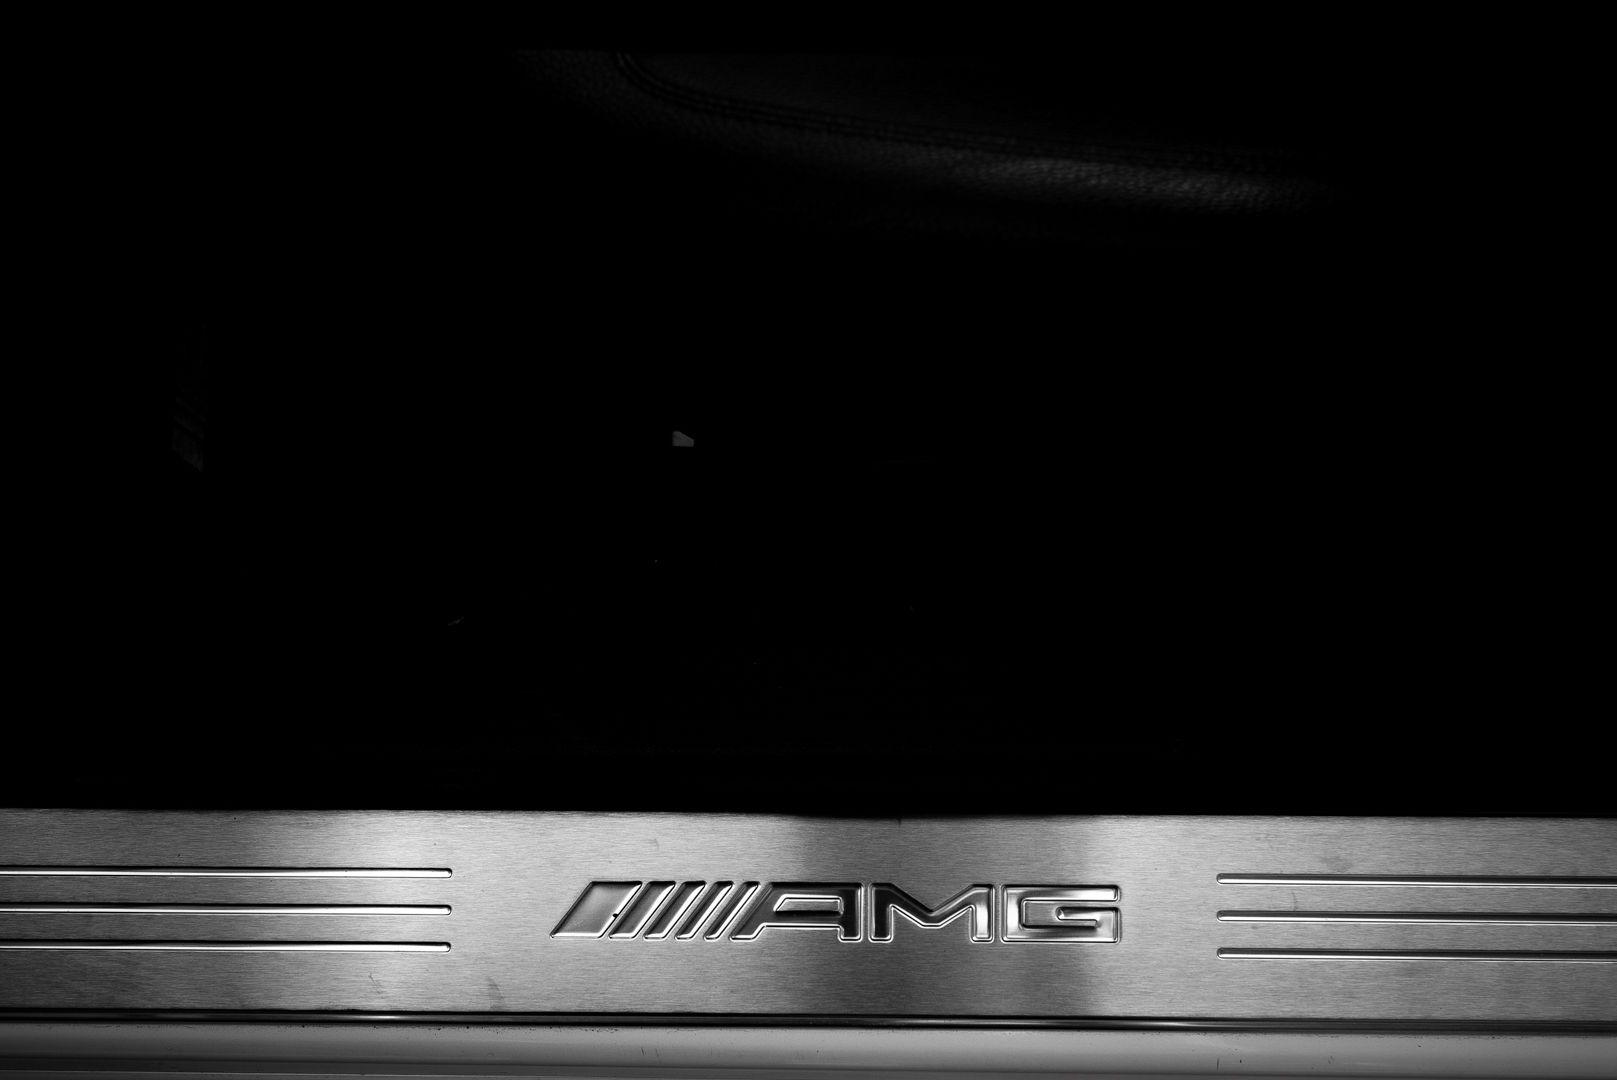 2012 Mercedes-Benz C63 AMG Black Series 71793